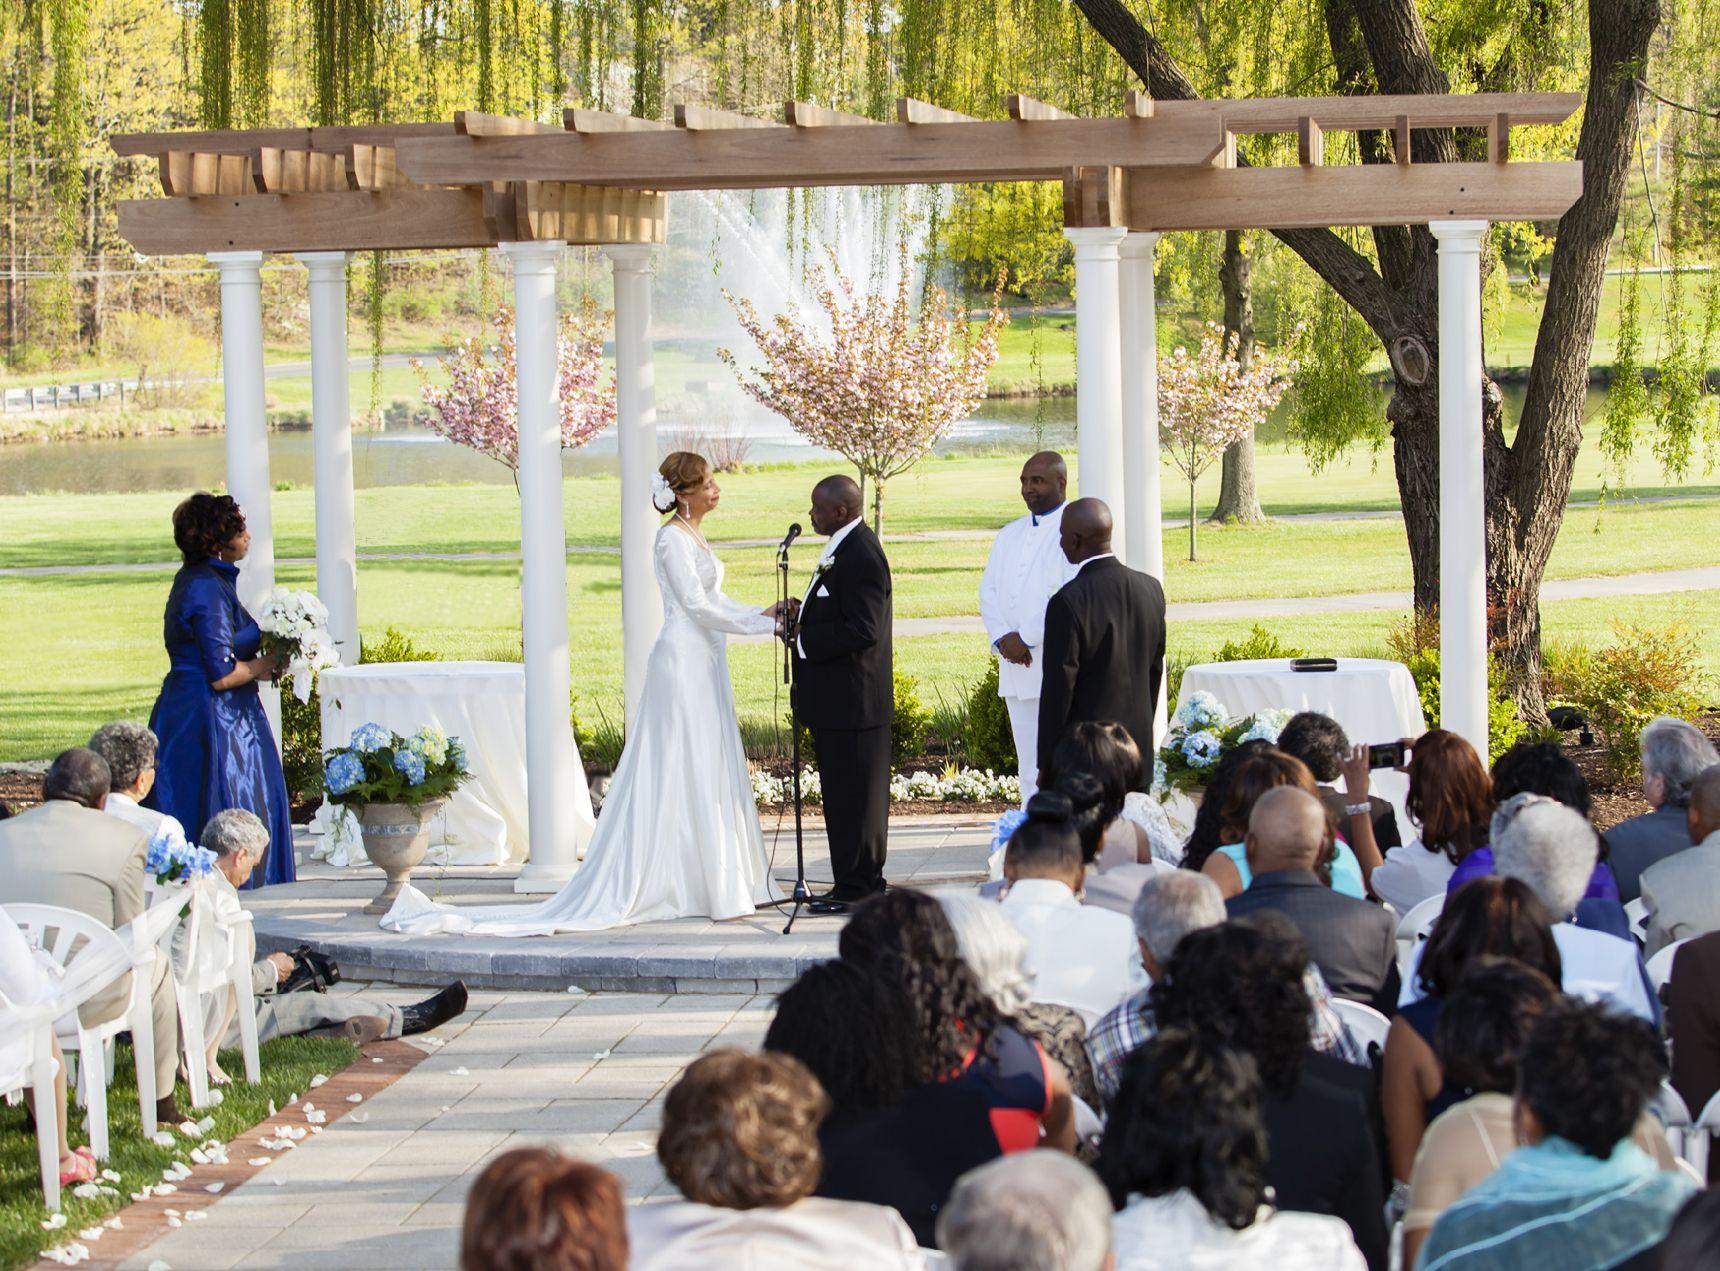 Wedding Pergola At Turf Valley Resort In Ellicott City Md Wedding Pergola Pergola Diy Pergola